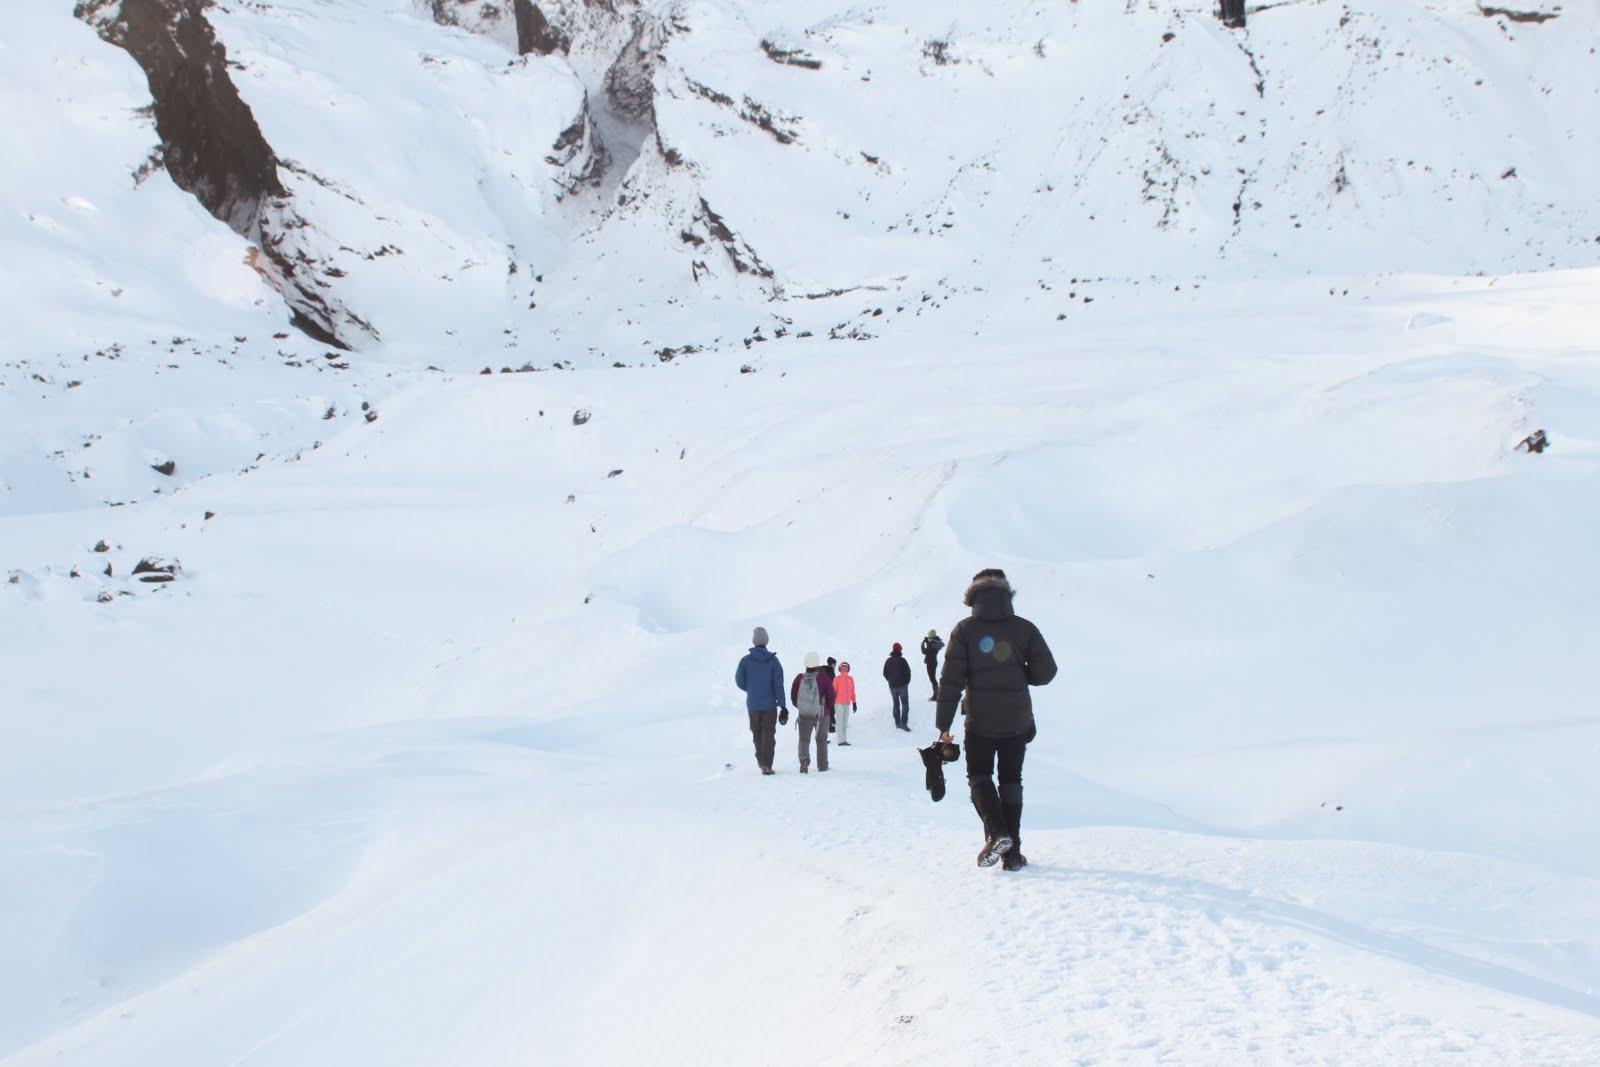 Thorsmork in winter